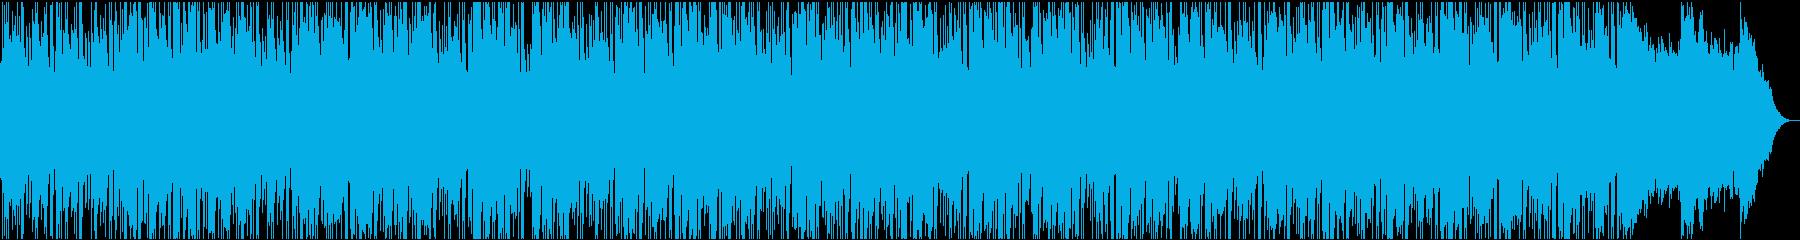 UKロック風インストの再生済みの波形